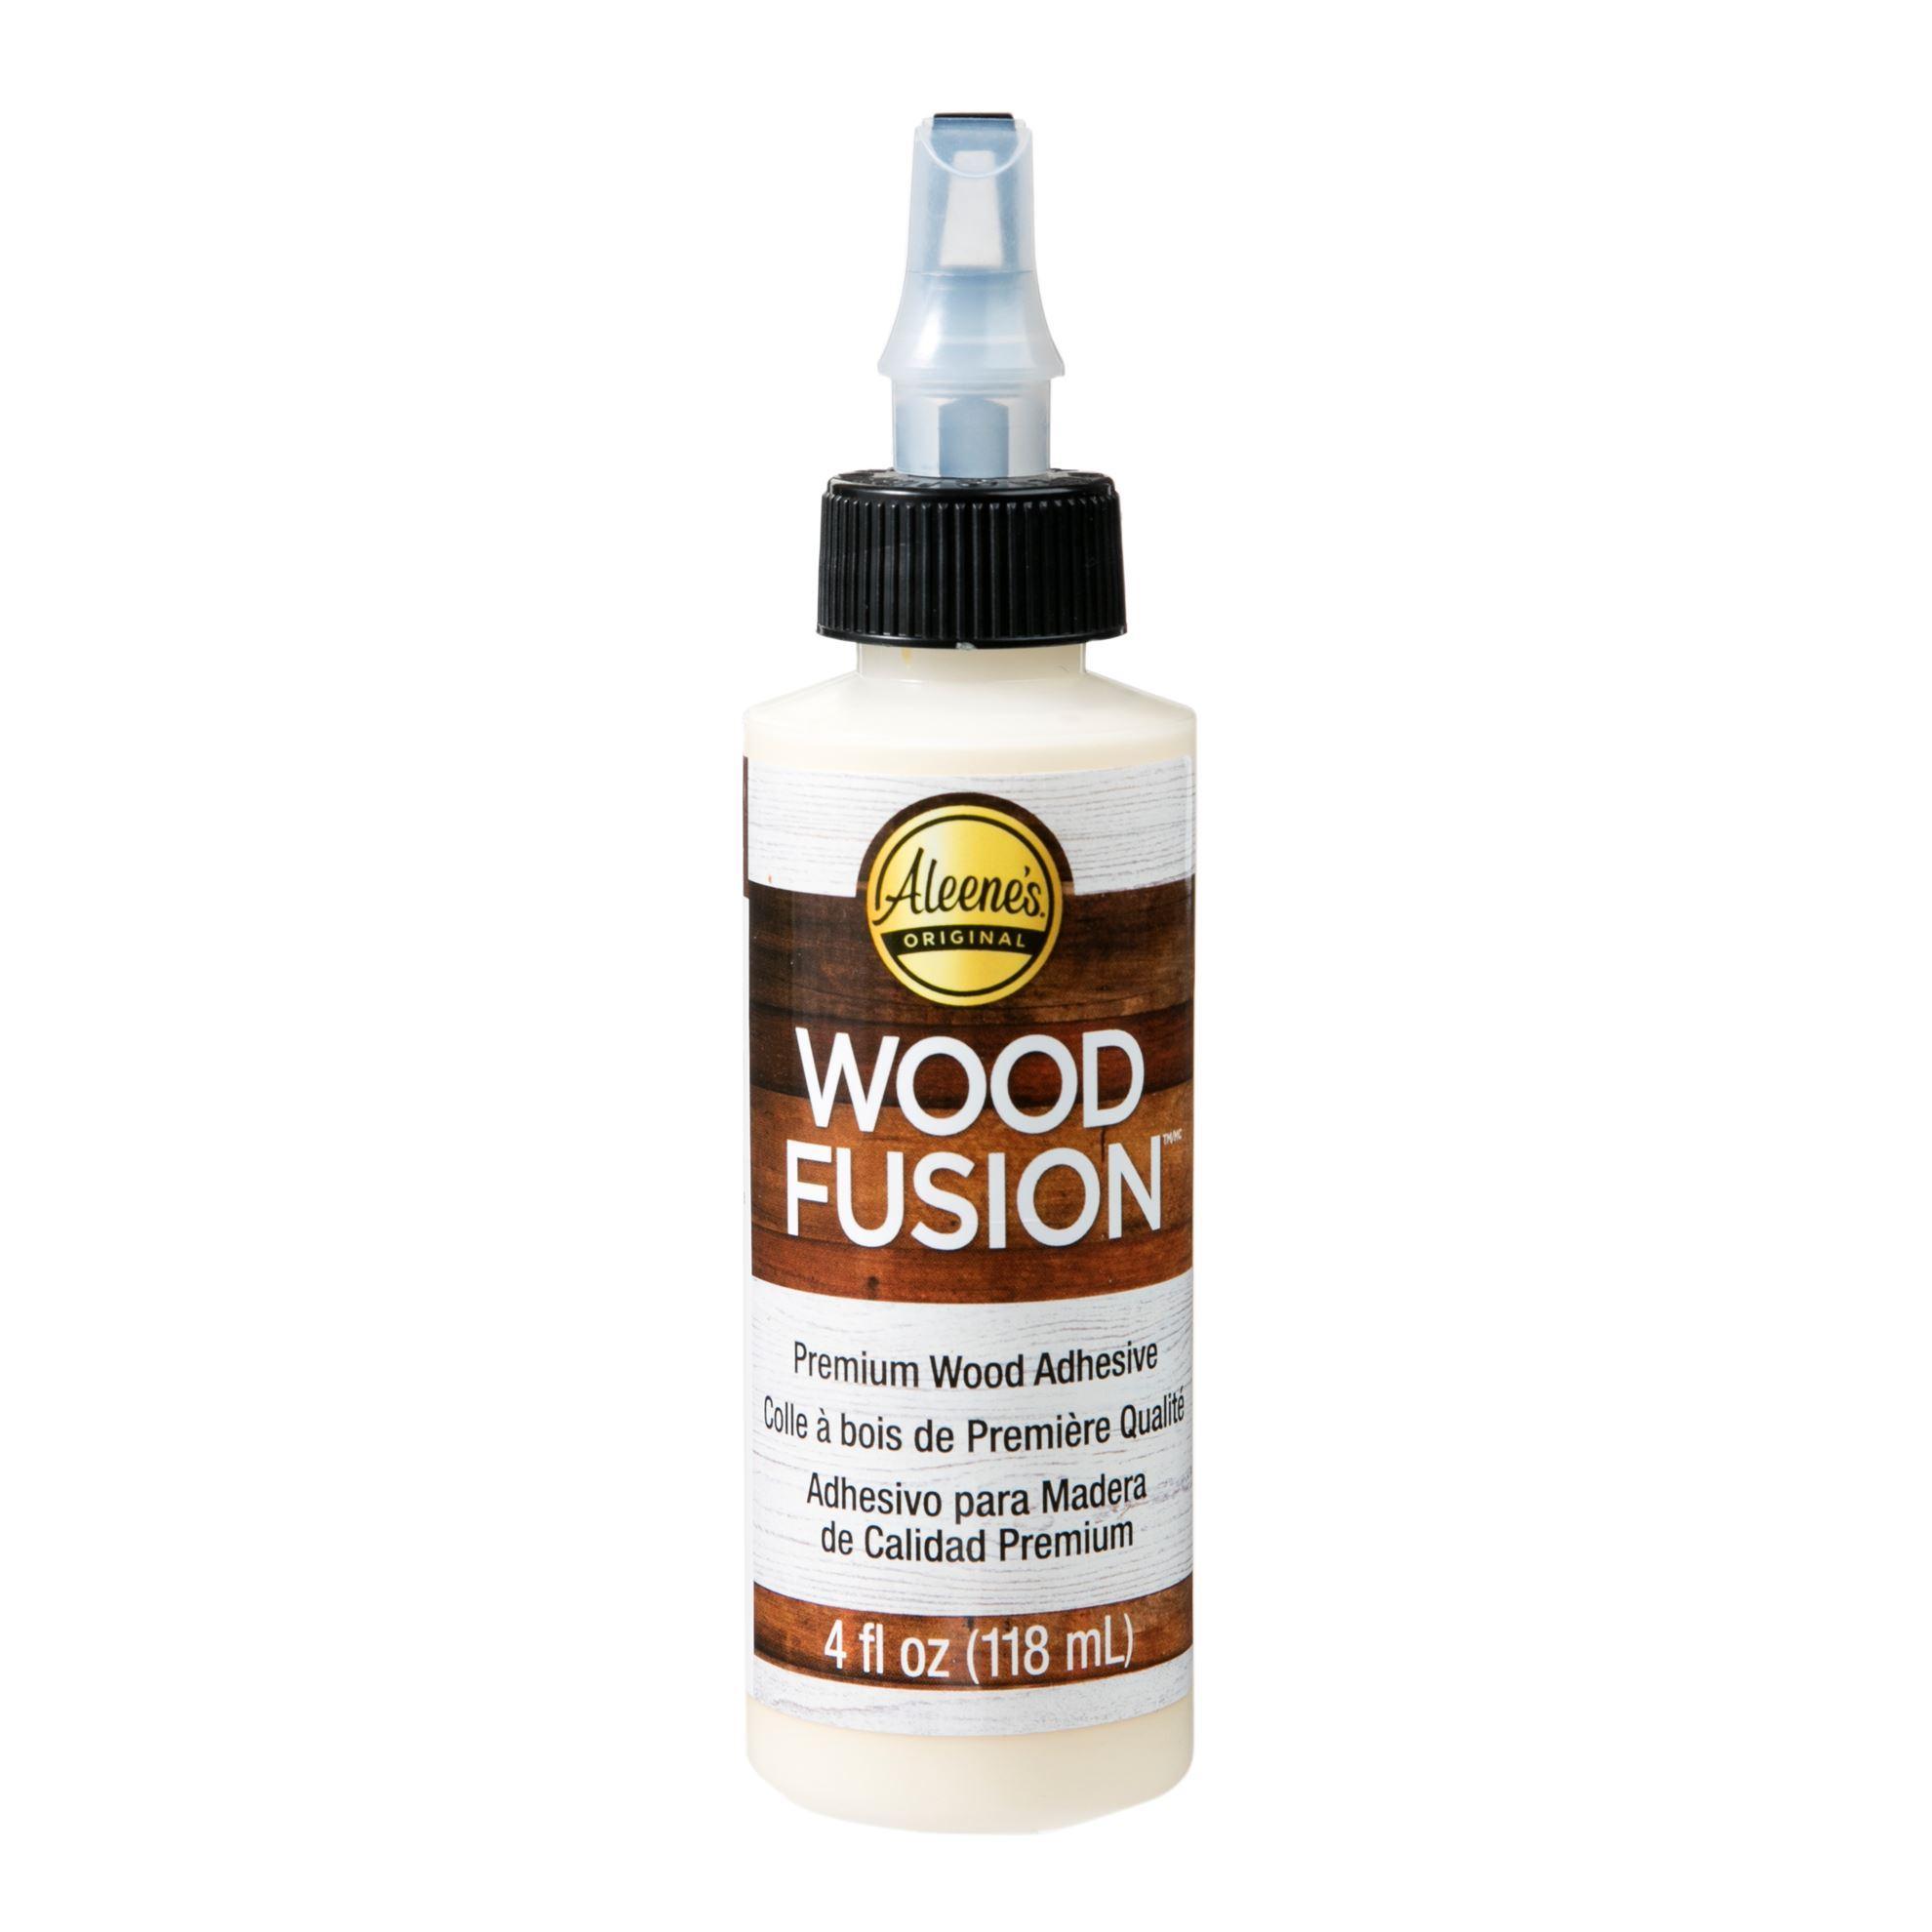 Aleene's Wood Fusion